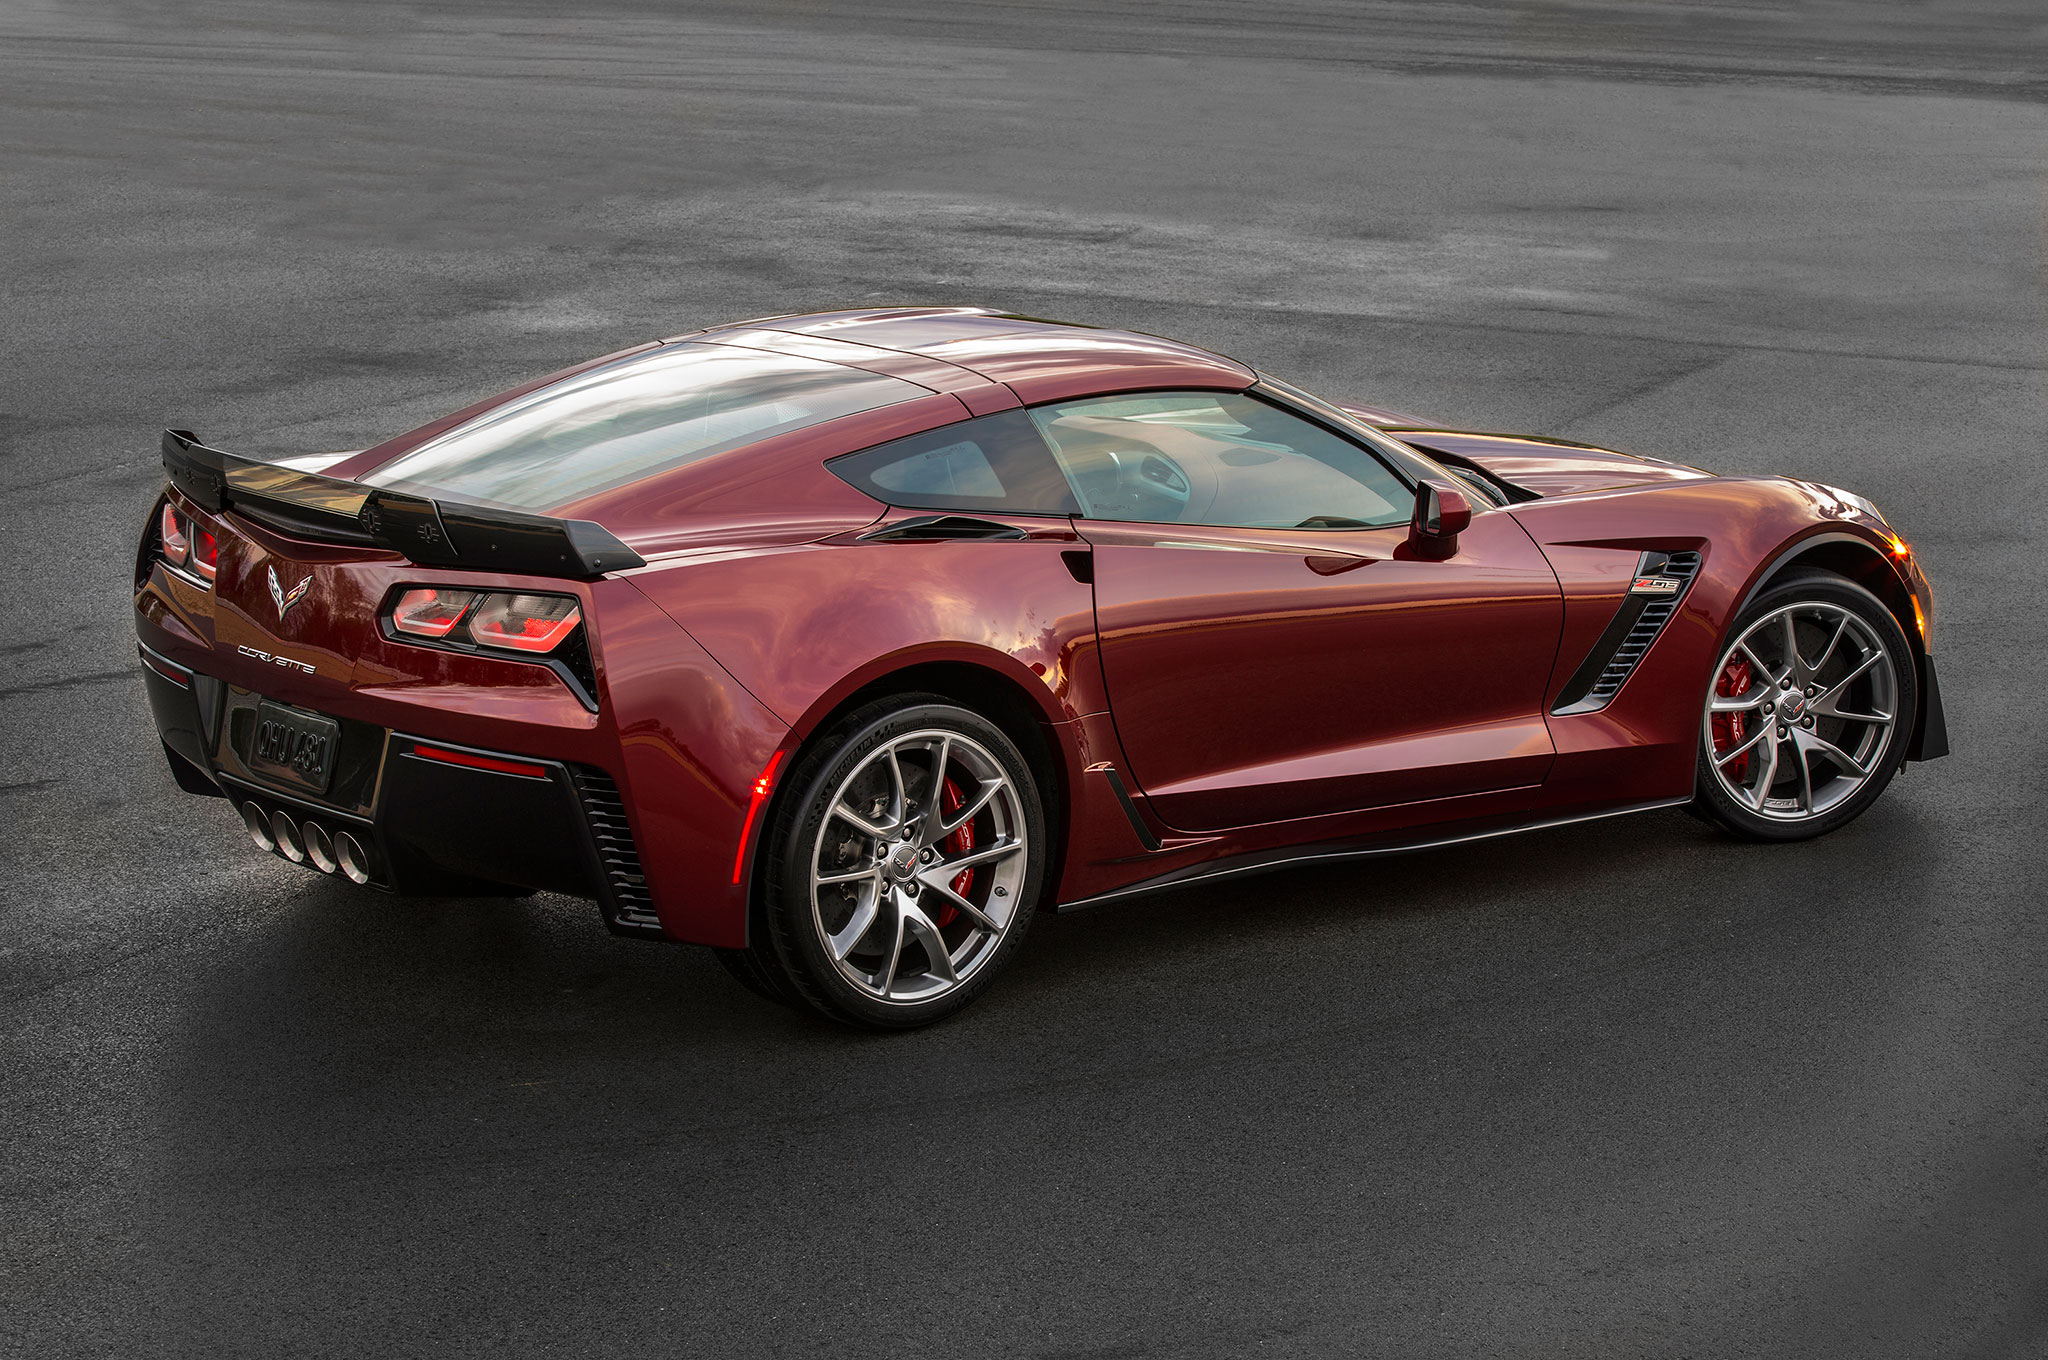 e Week With 2016 Chevrolet Corvette Convertible Z51